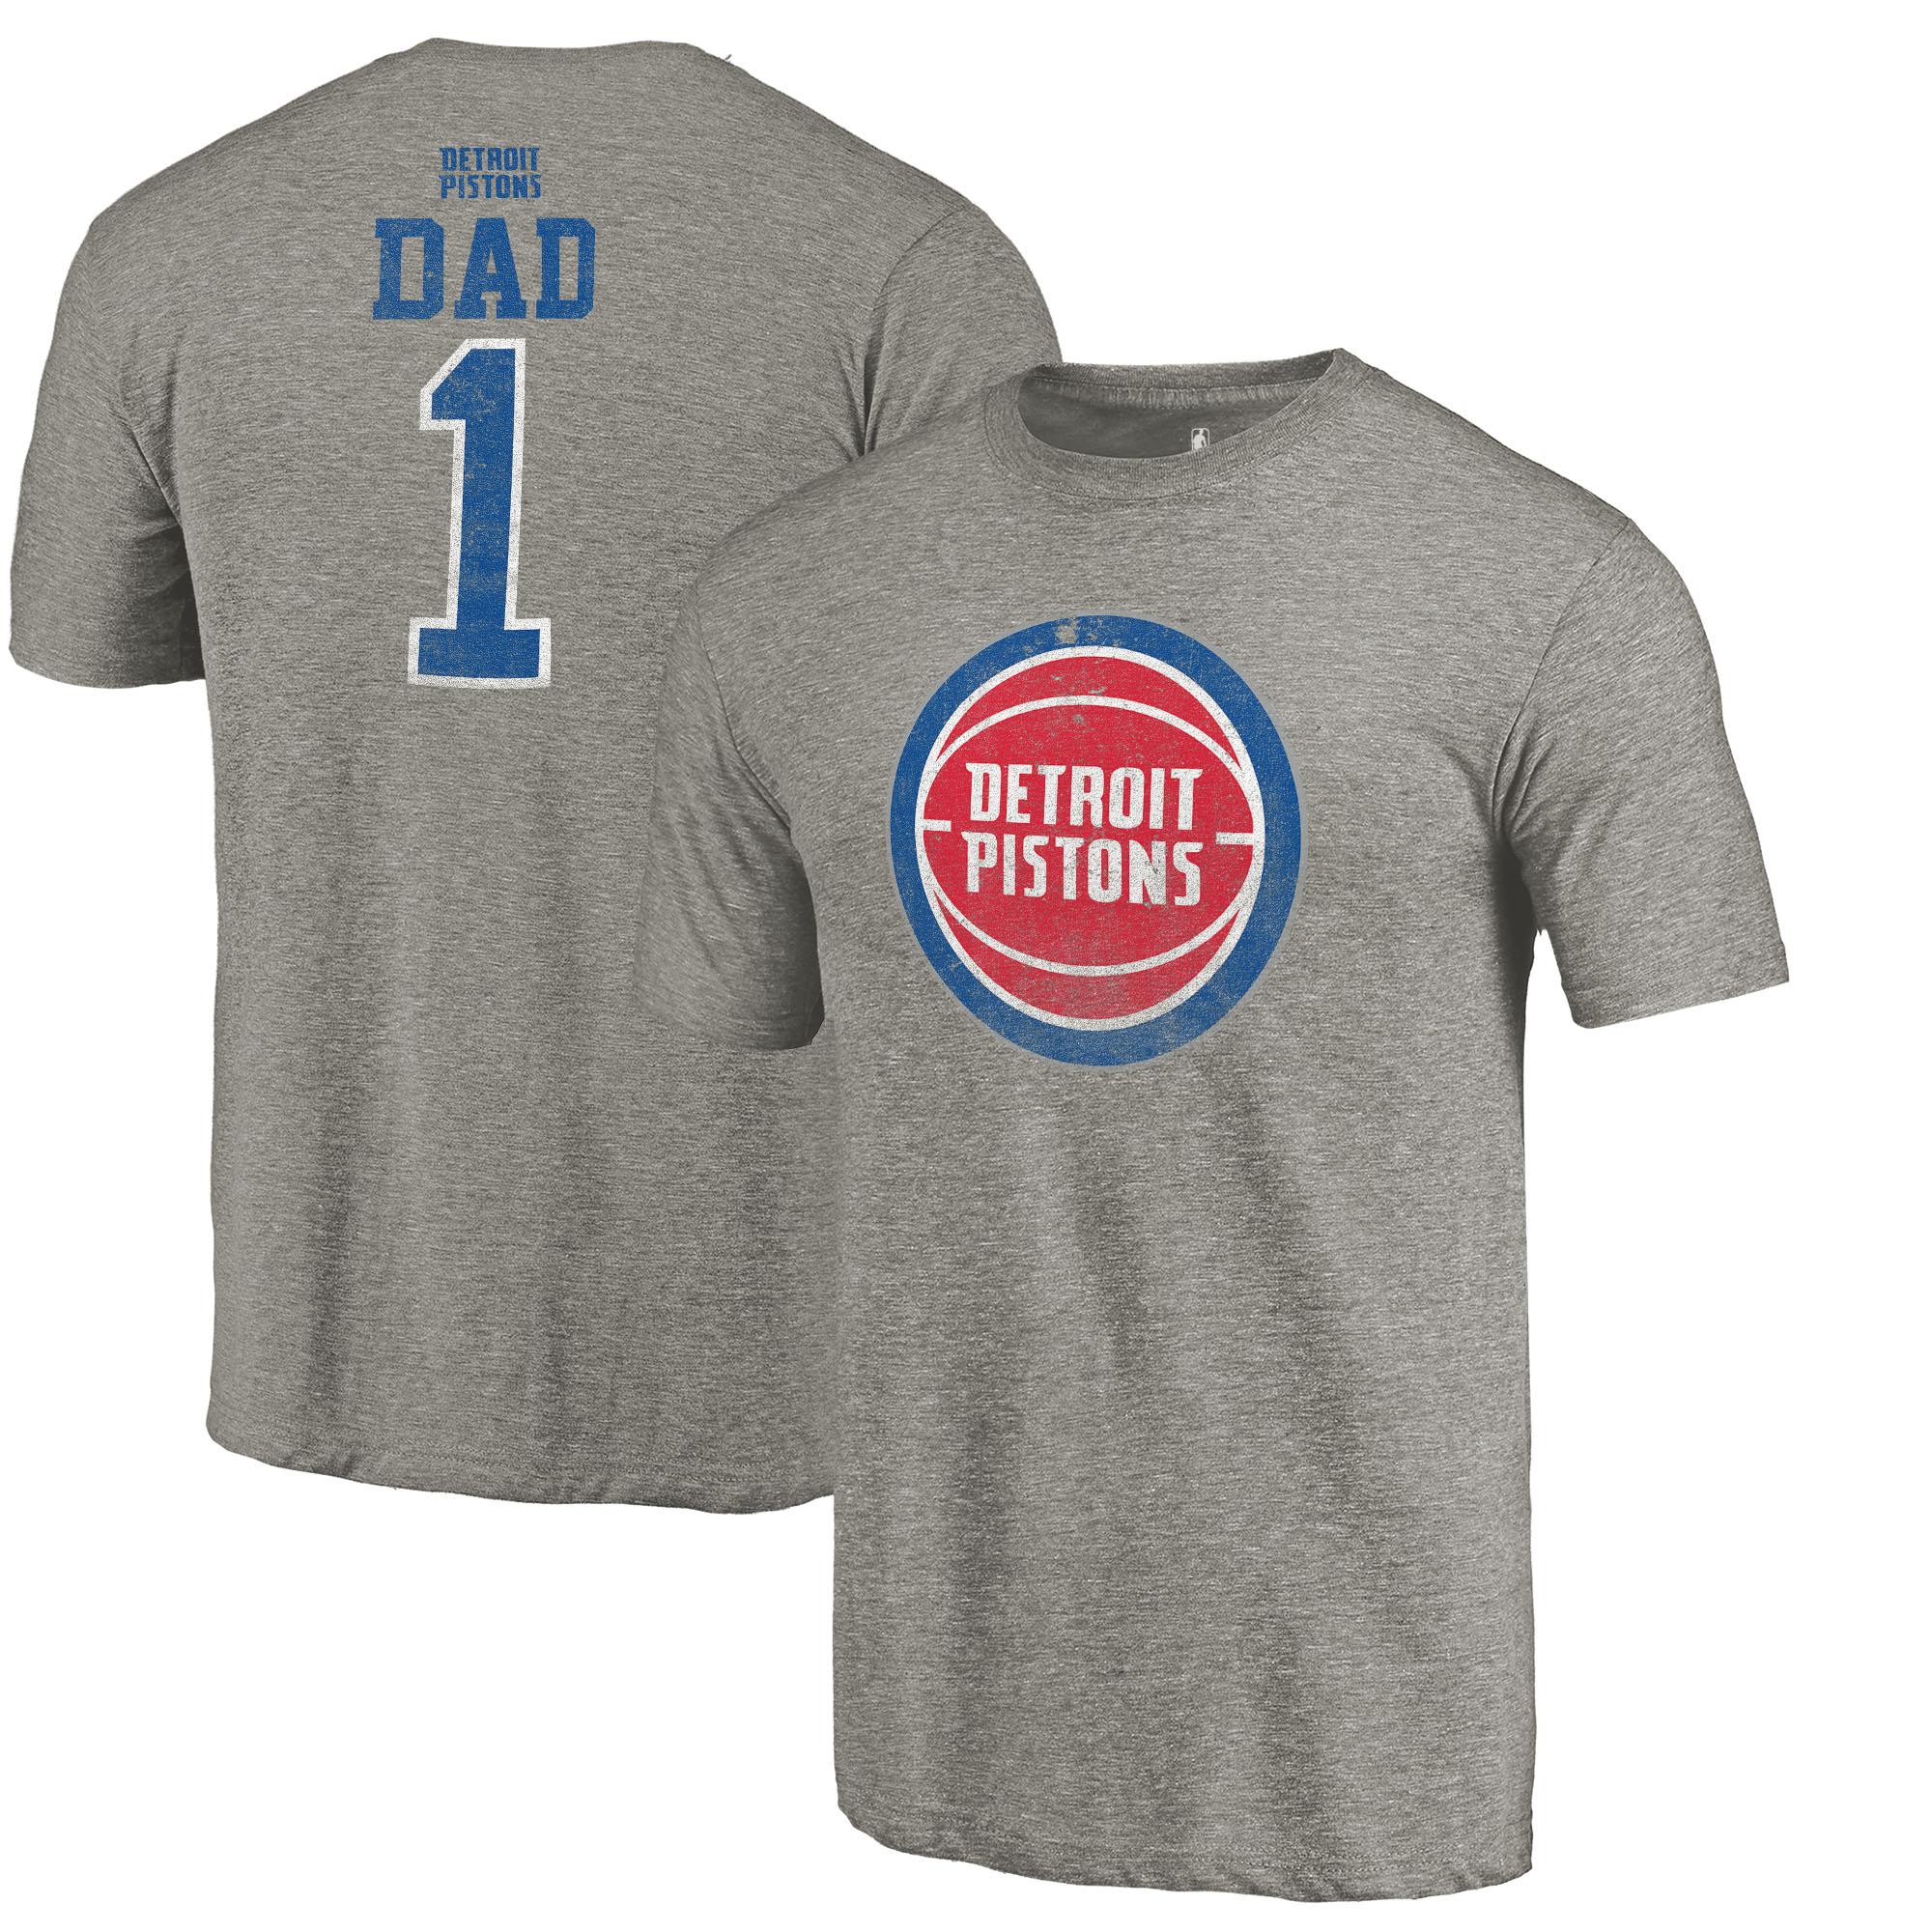 Detroit Pistons Fanatics Branded Greatest Dad Tri-Blend T-Shirt - Gray